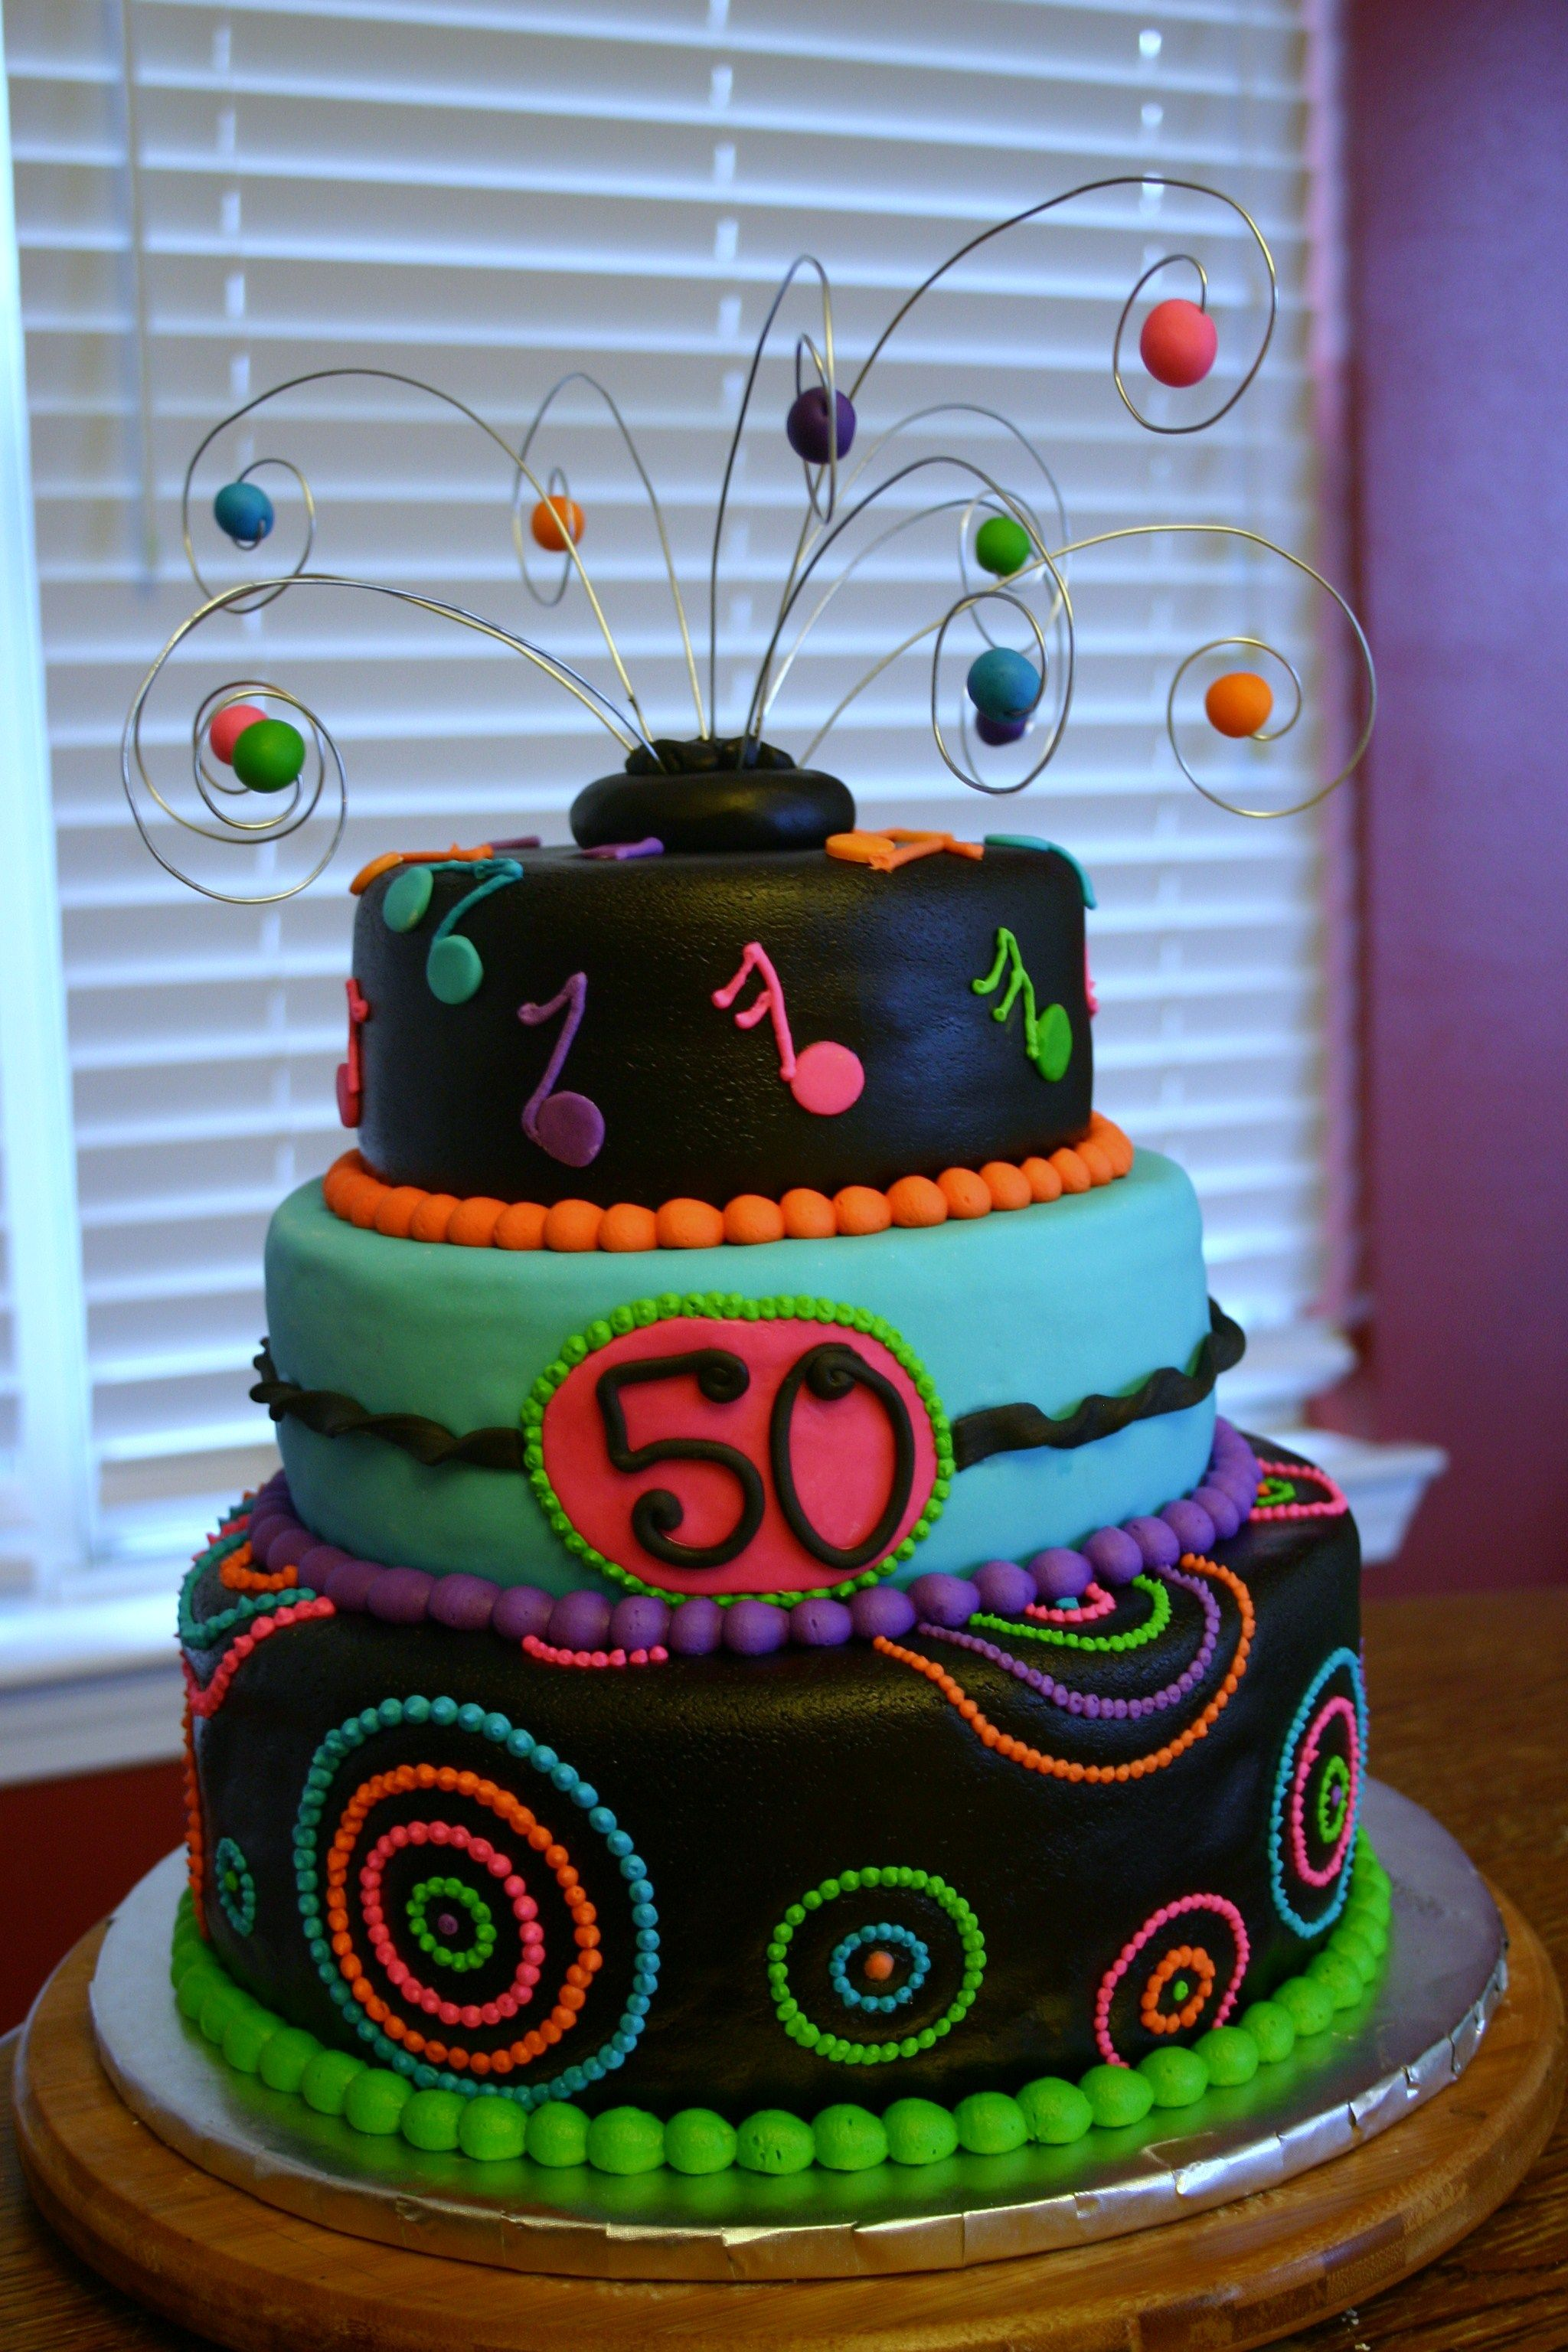 Neon color birthday cake